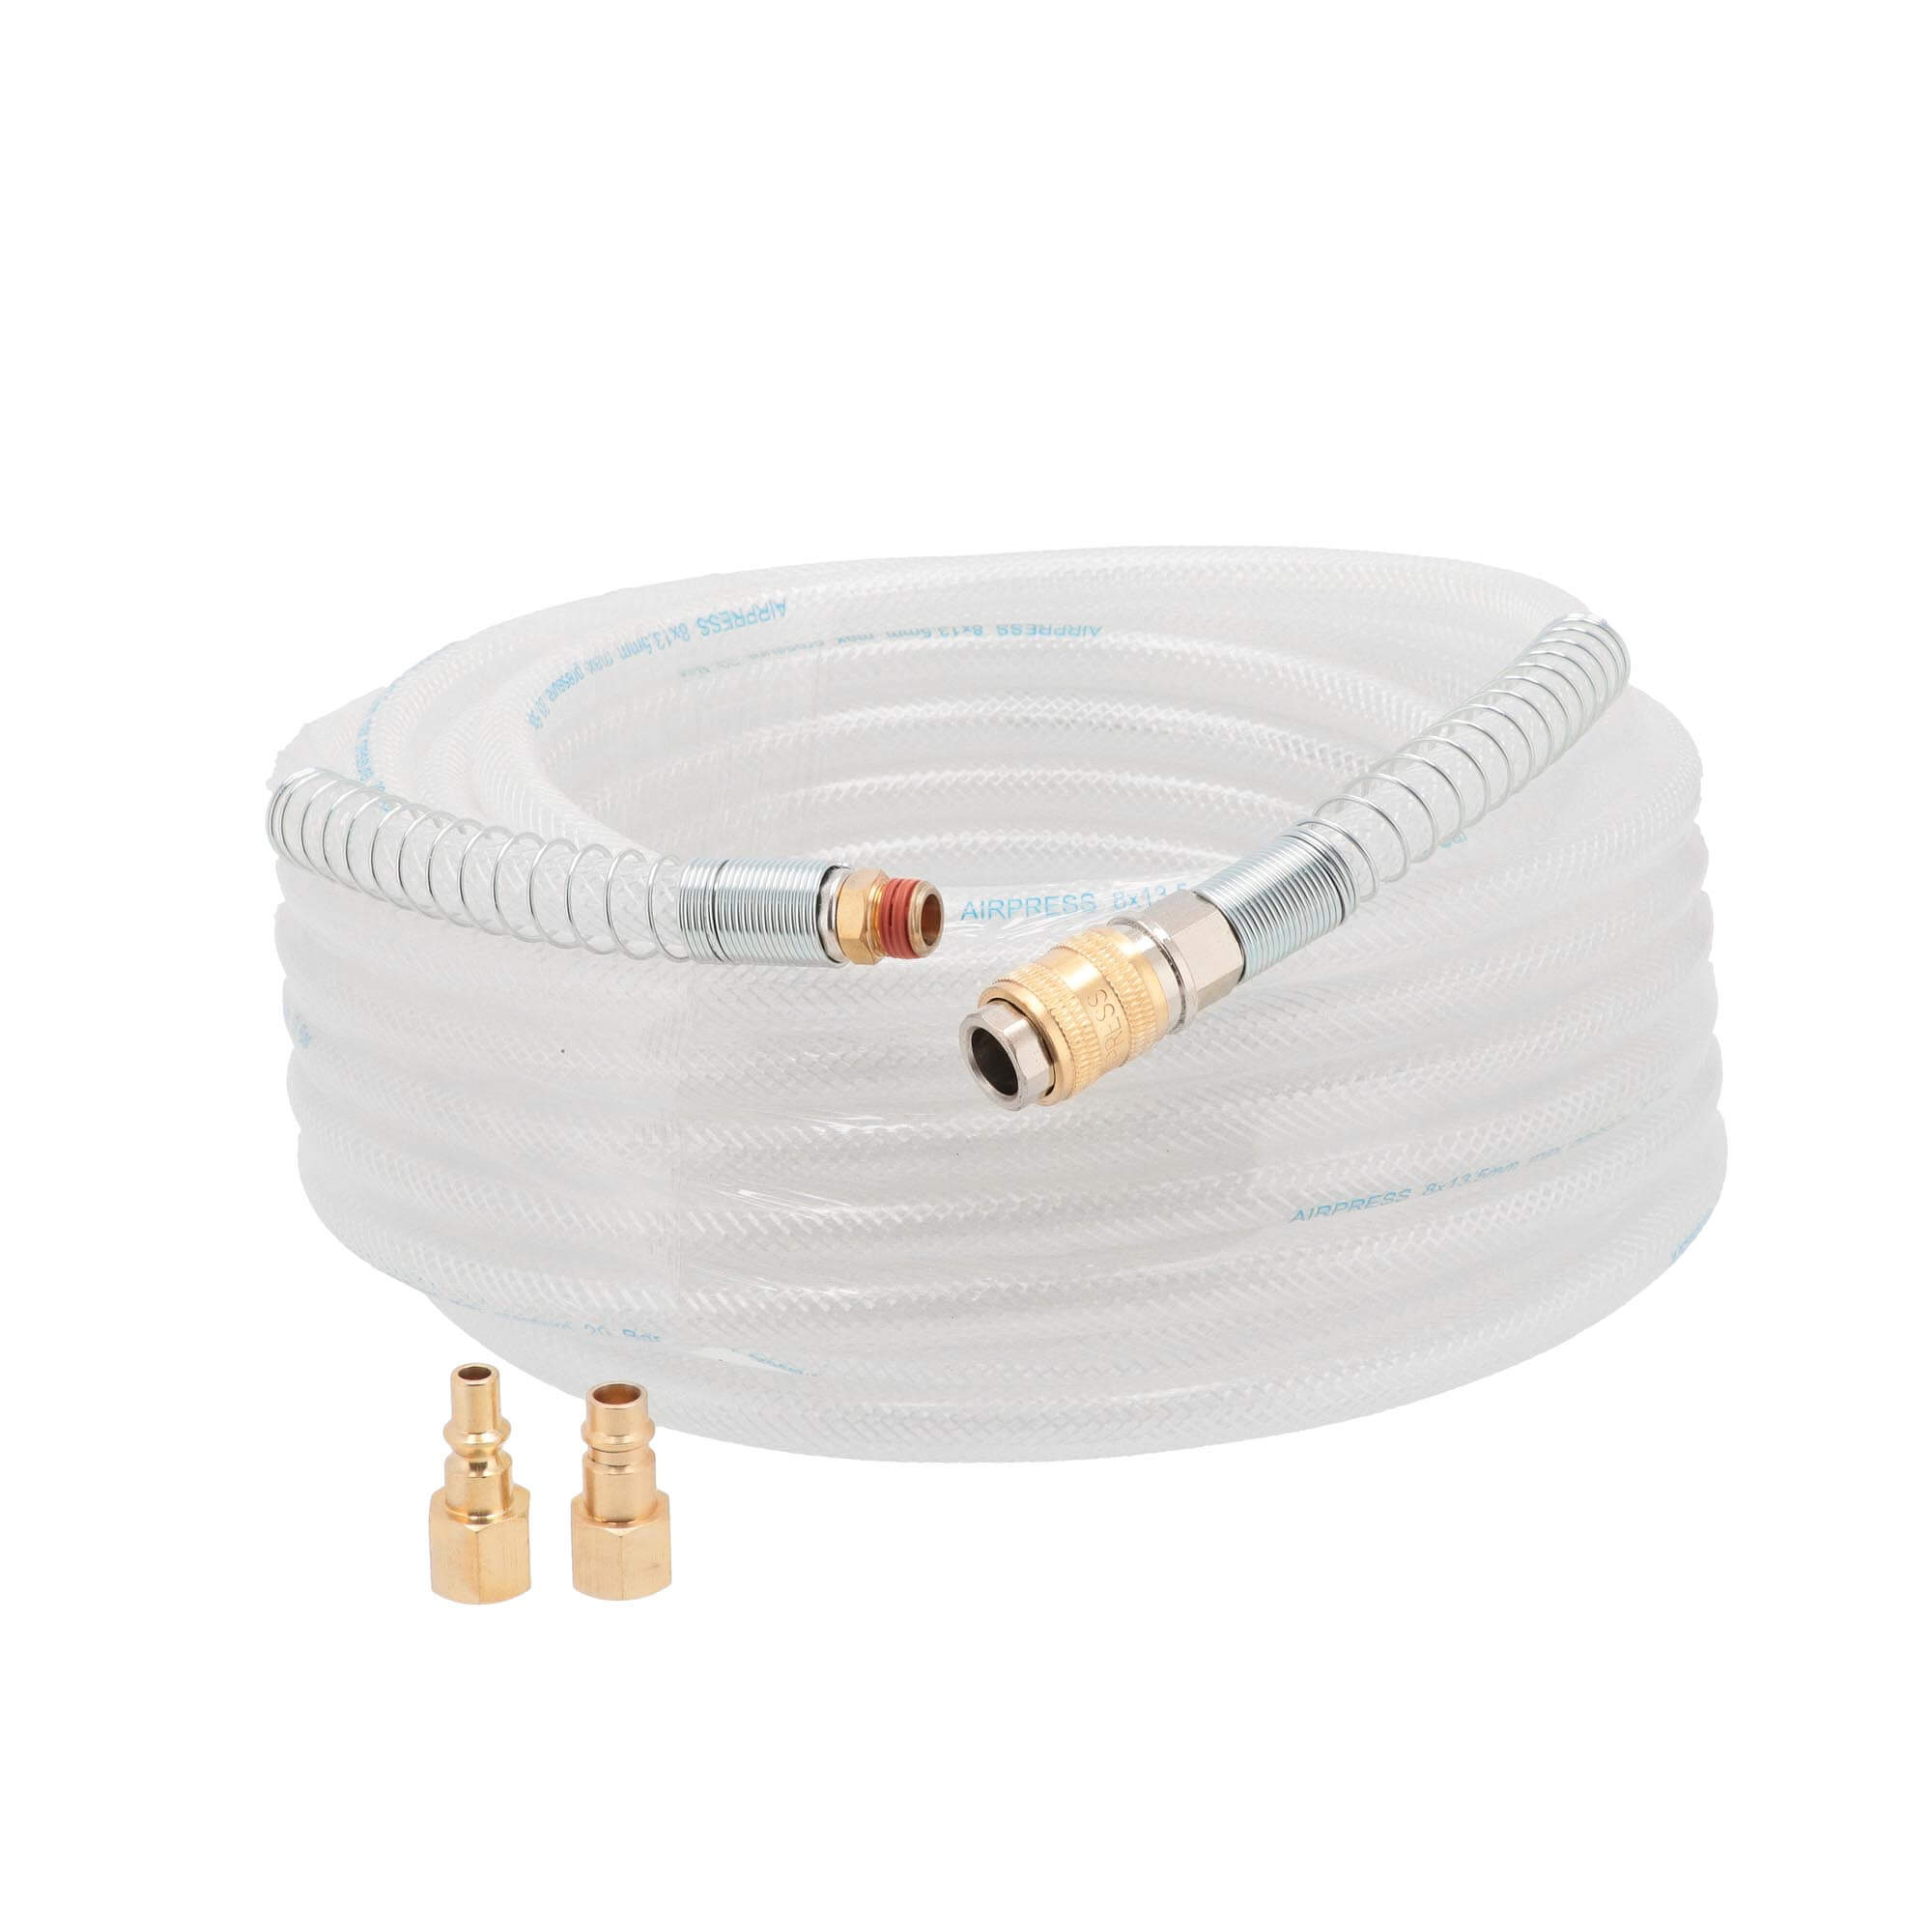 Tuyau d'air comprimé 15 m 8 mm PVC